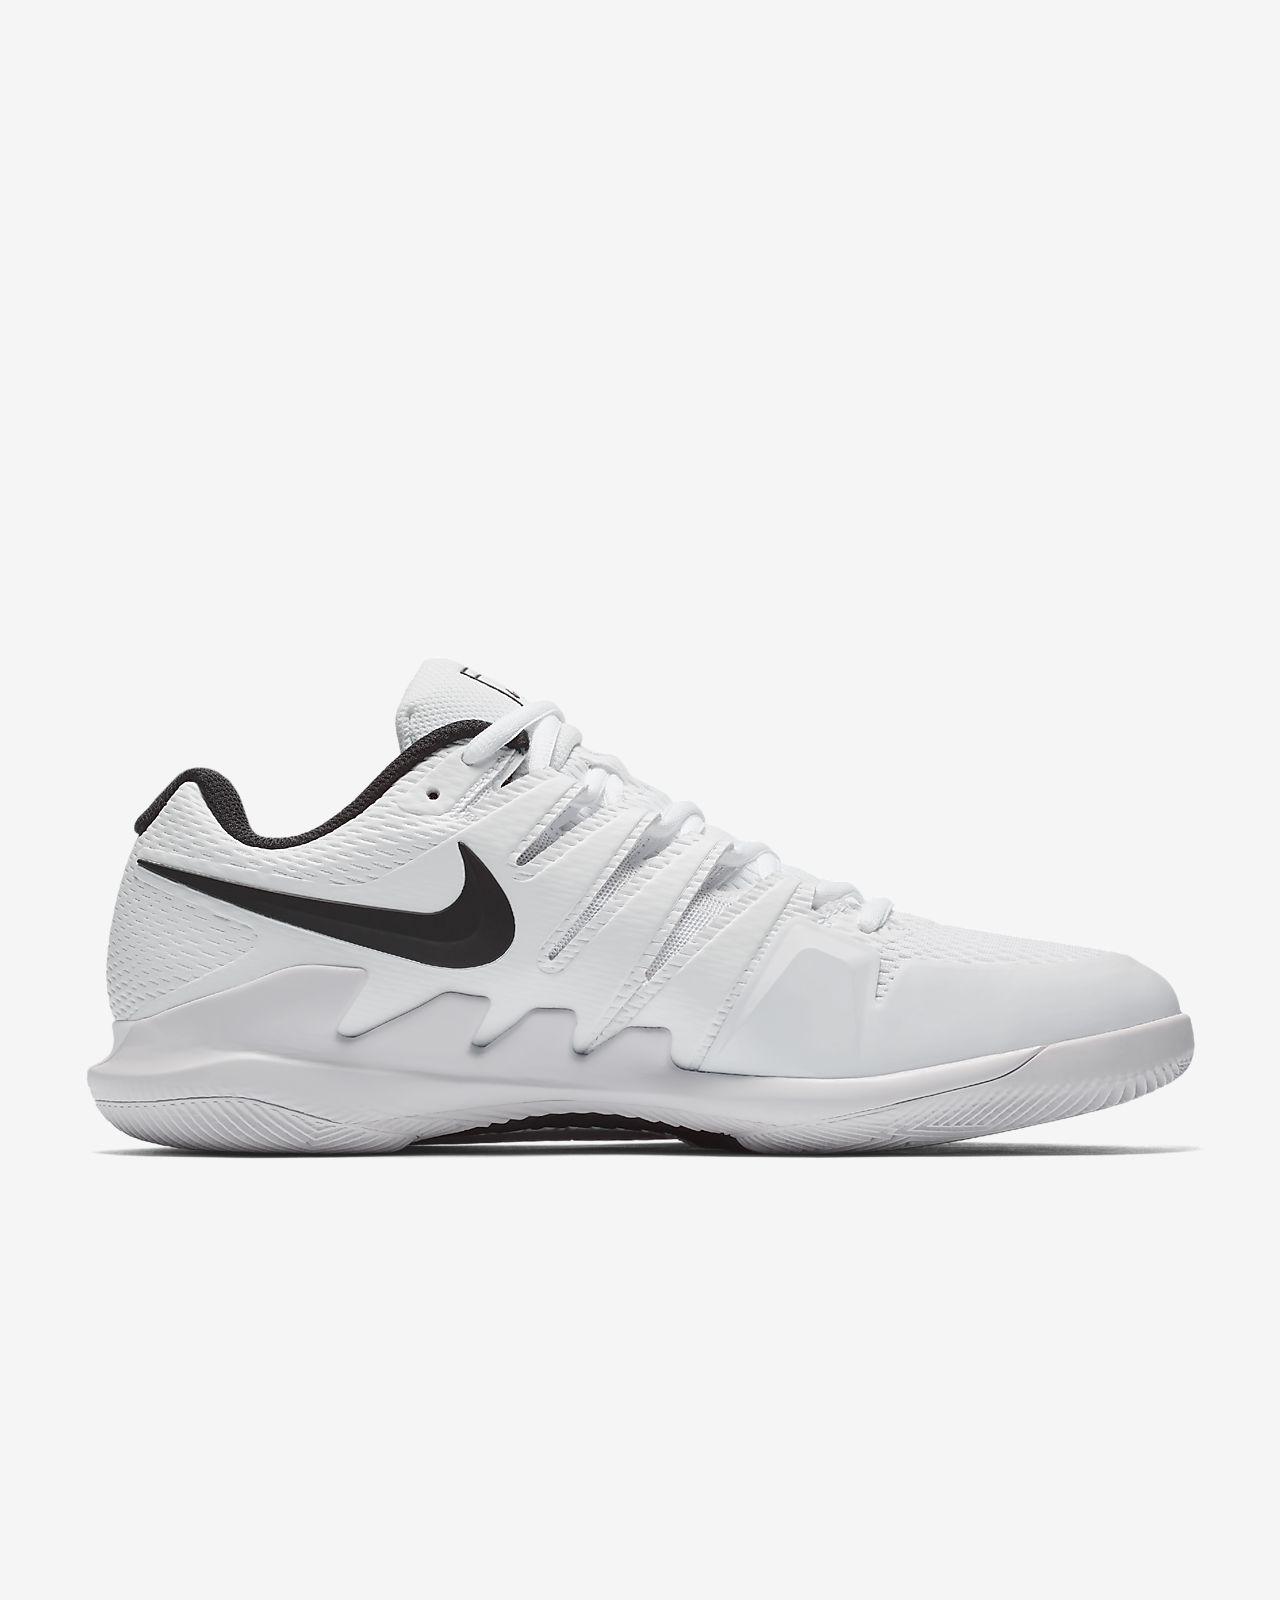 competitive price 67d70 c7a88 Nike Air Zoom Vapor X HC tennissko til herre. Nike.com NO